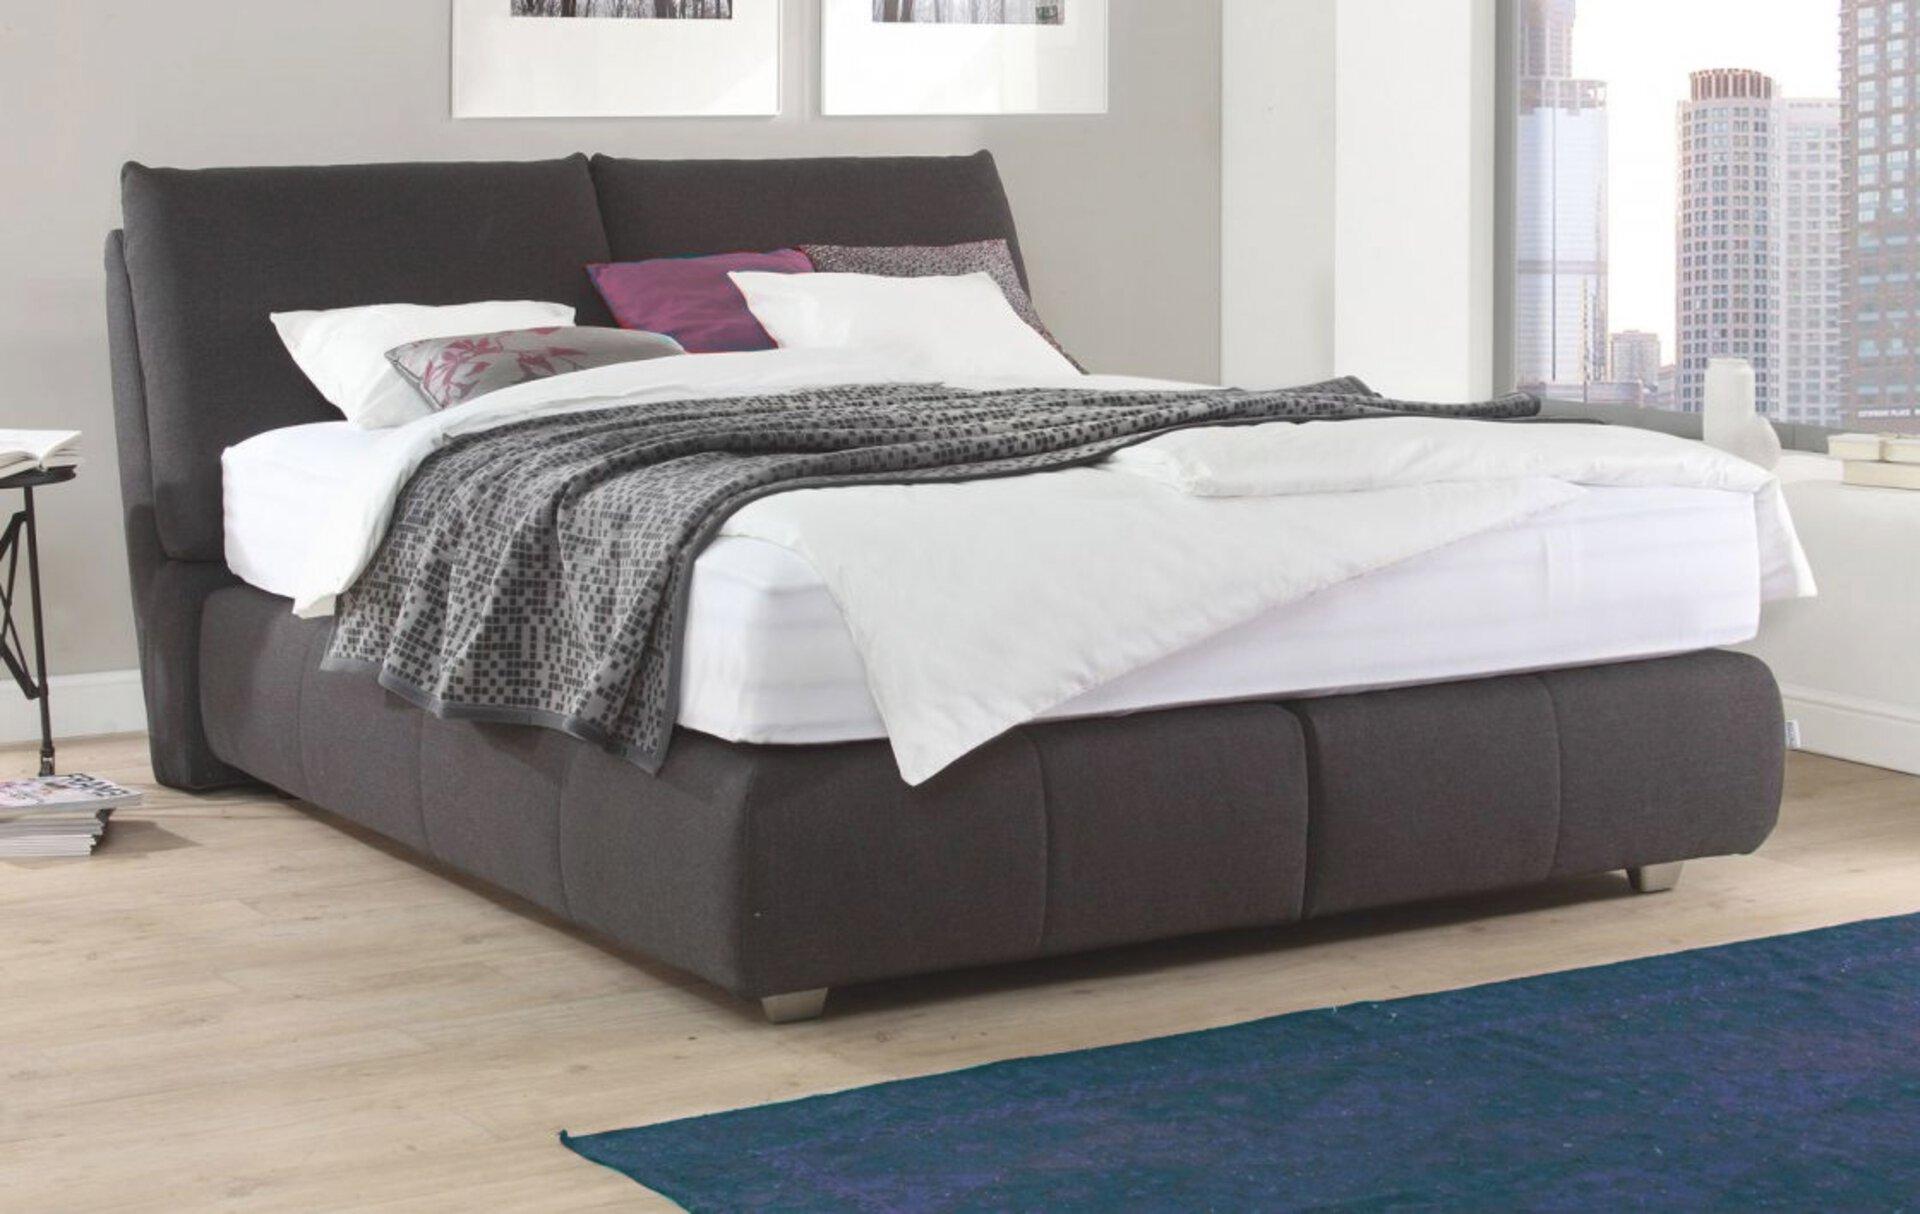 Boxspringbett SUPREME COMFORT MONDO Textil schwarz 187 x 119 x 205 cm